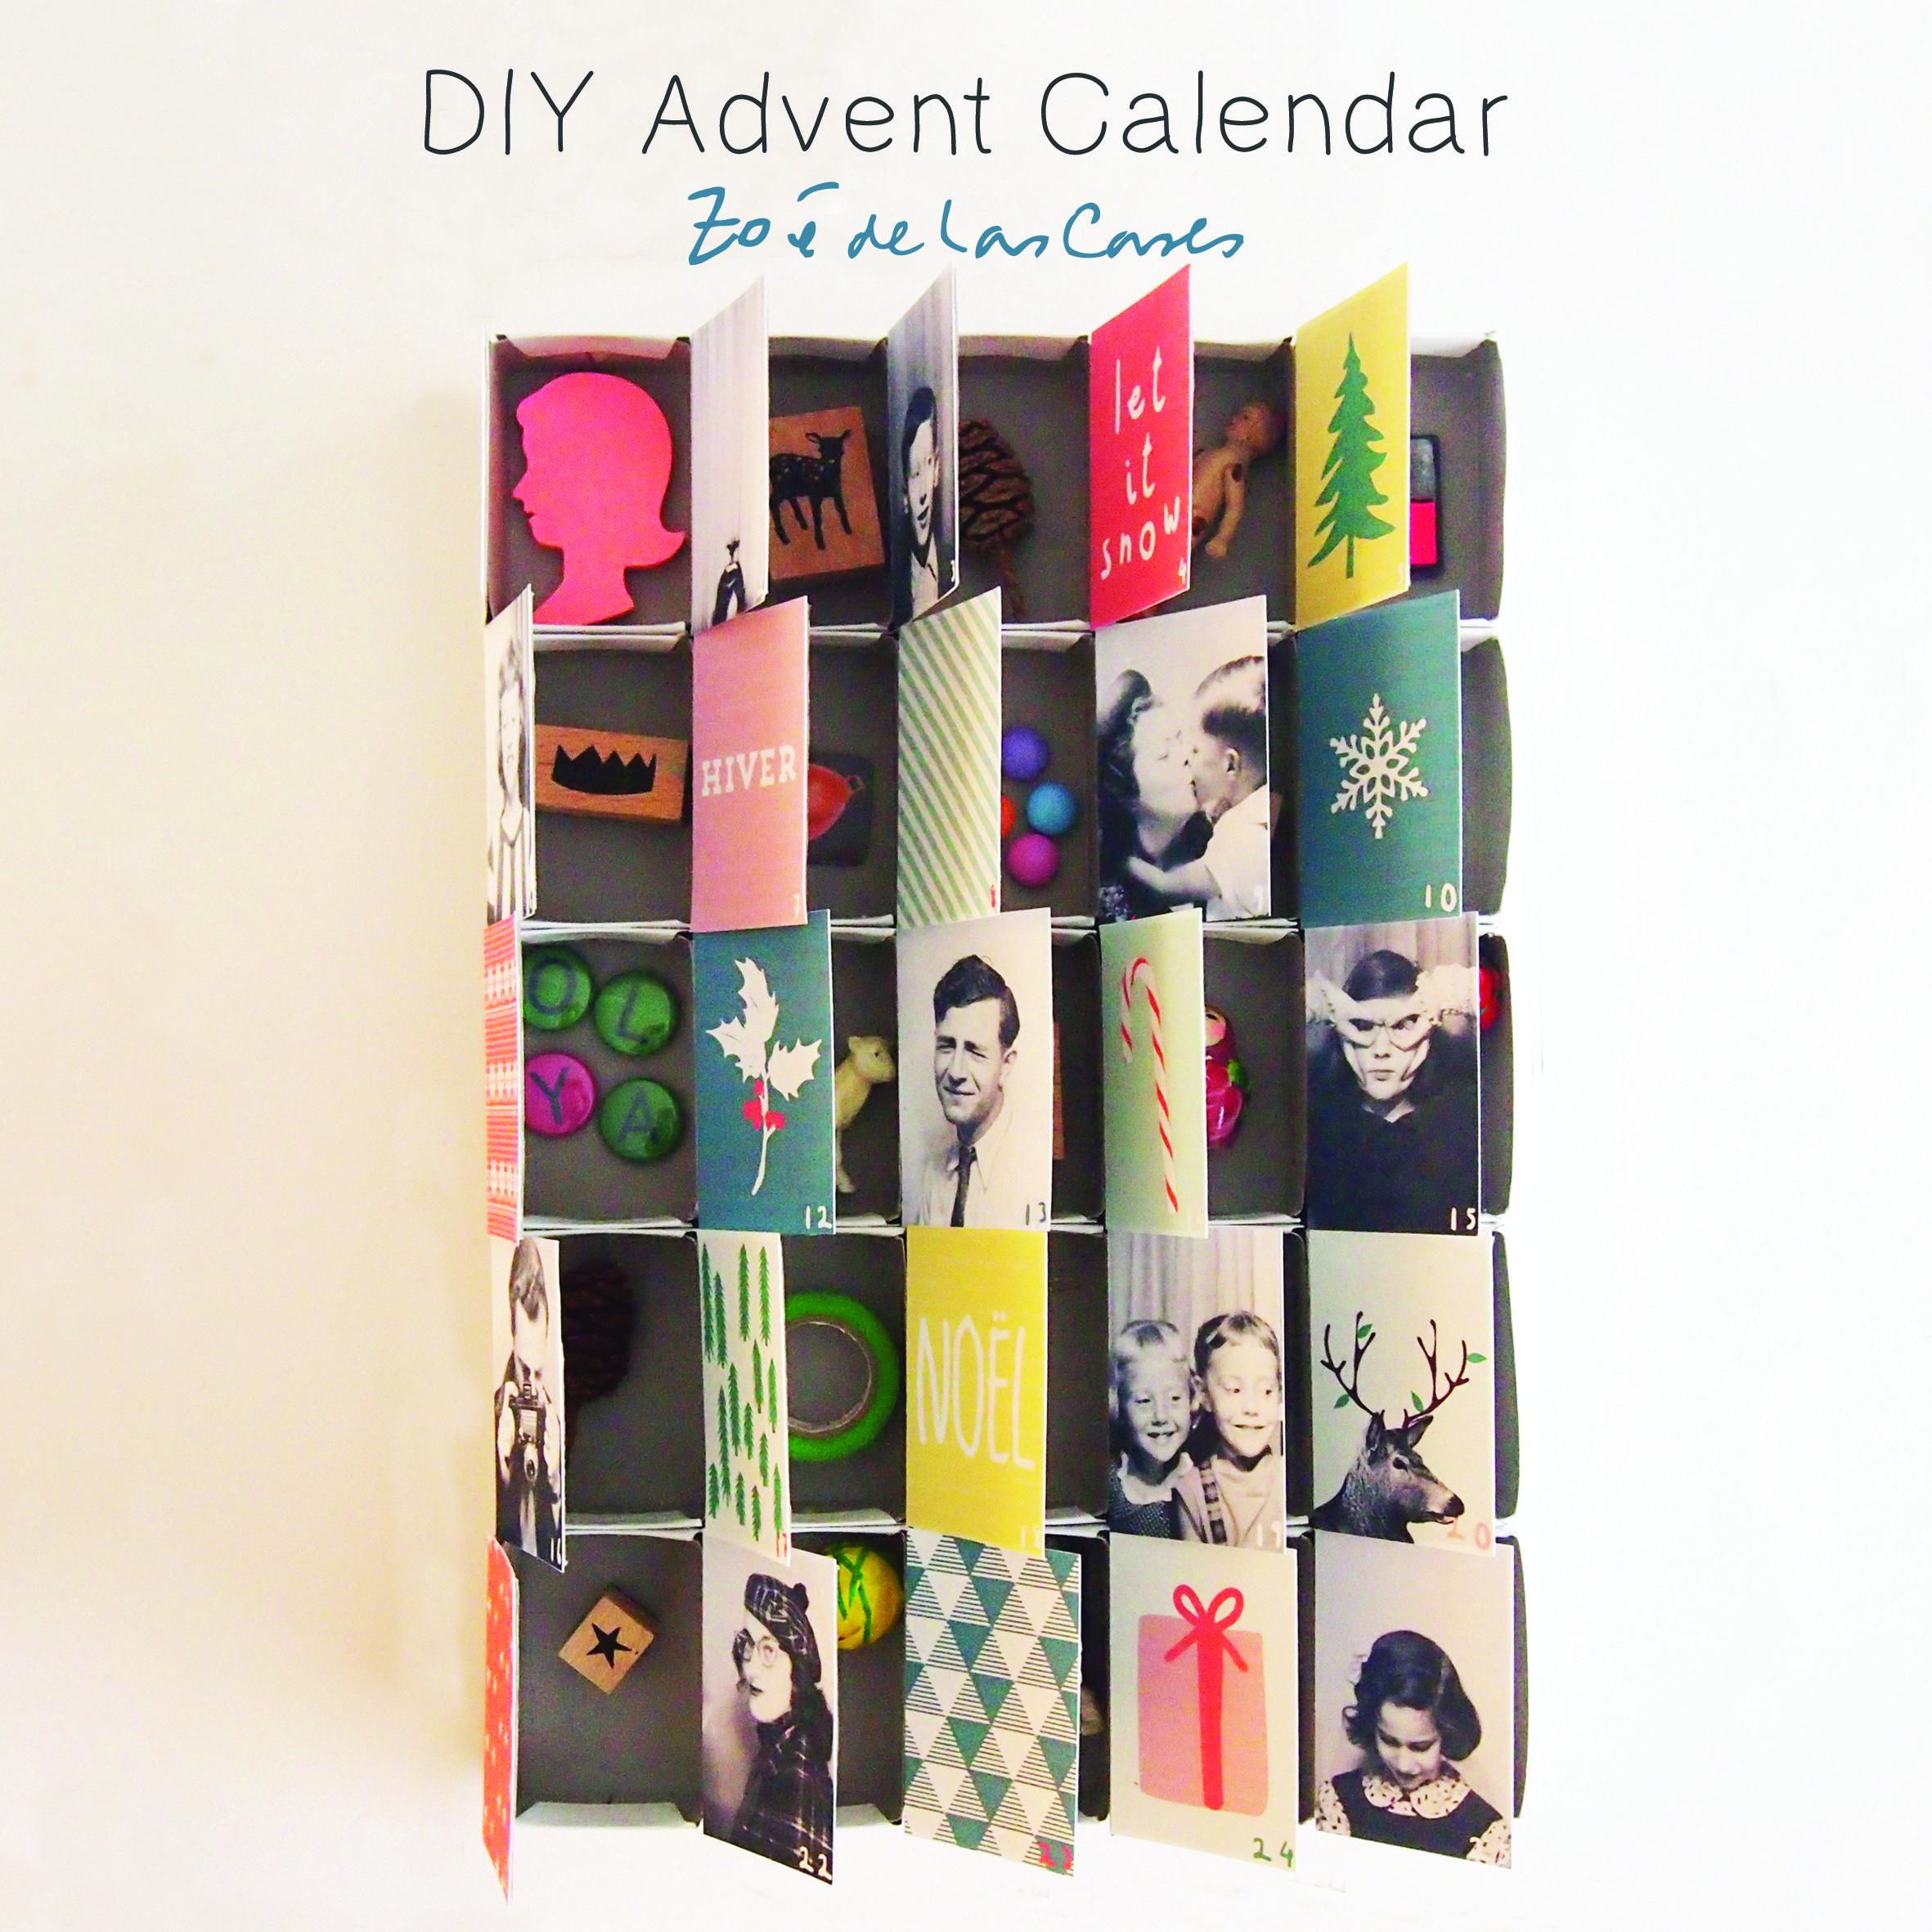 Diy Advent Calendar Using Old Christmas Cards, By Zo De